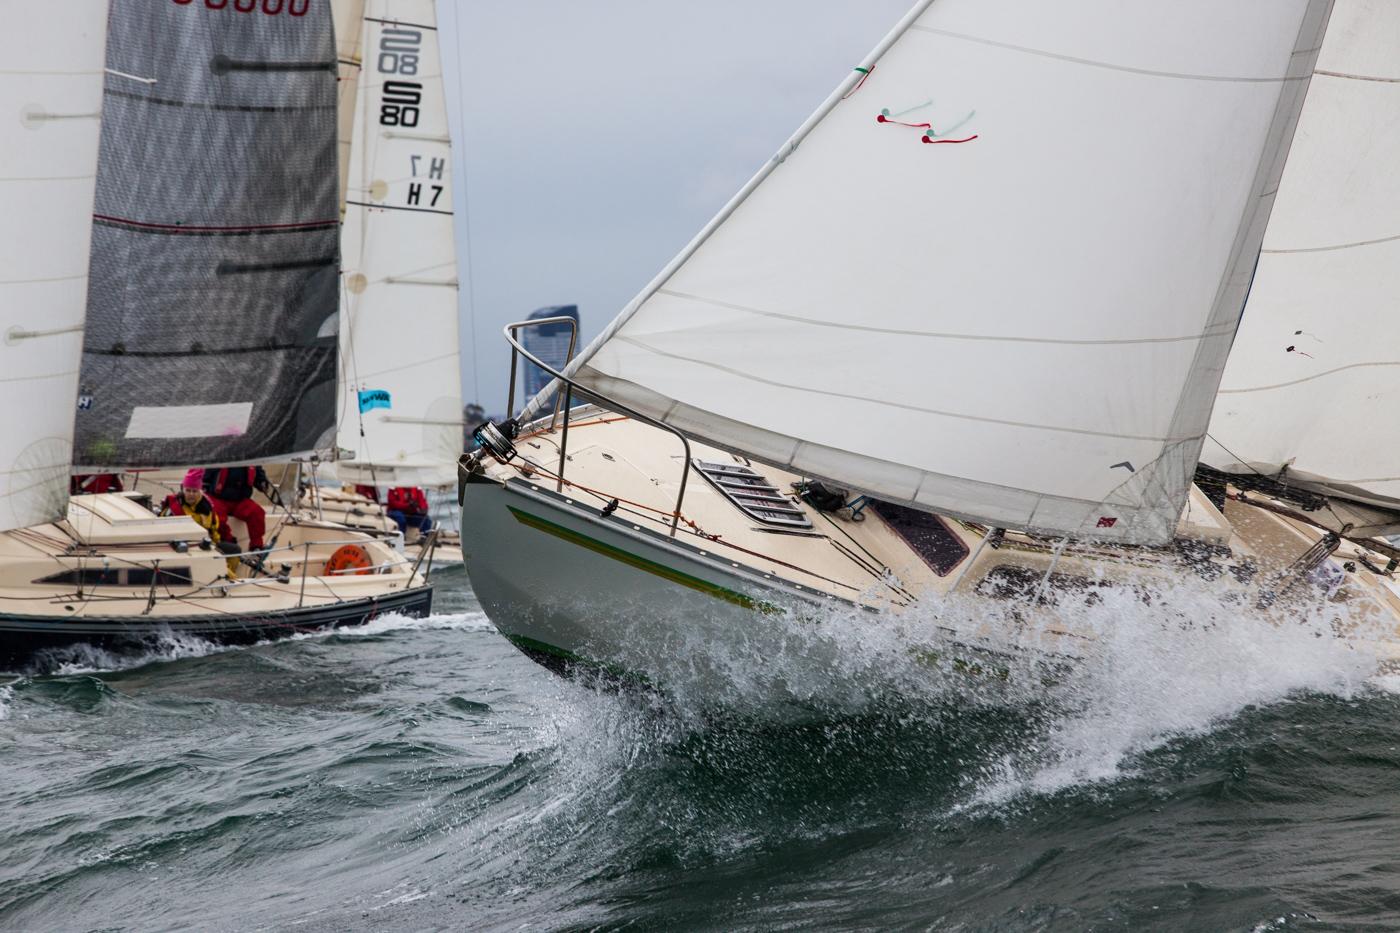 Close racing at the Australian Women's Keelboat Regatta. Photo Bruno Cocozza Photography.